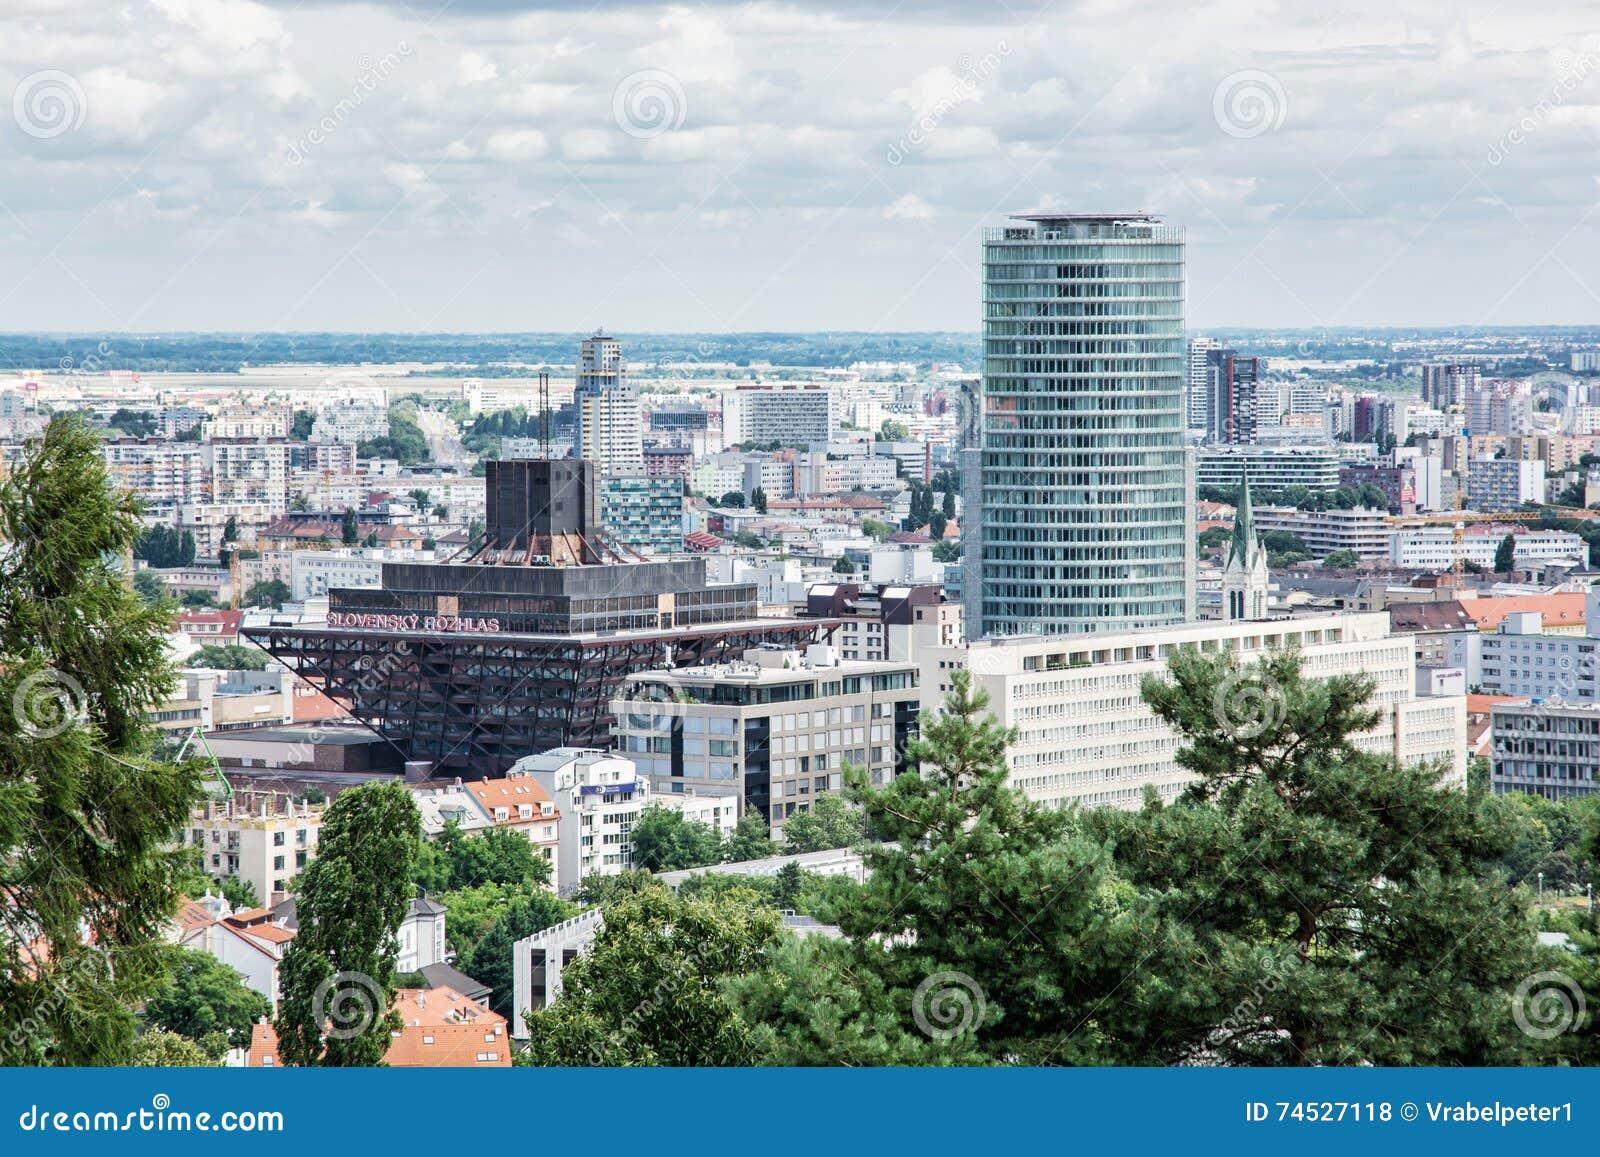 Urban scene in Bratislava, capital of Slovakia with slovak radio